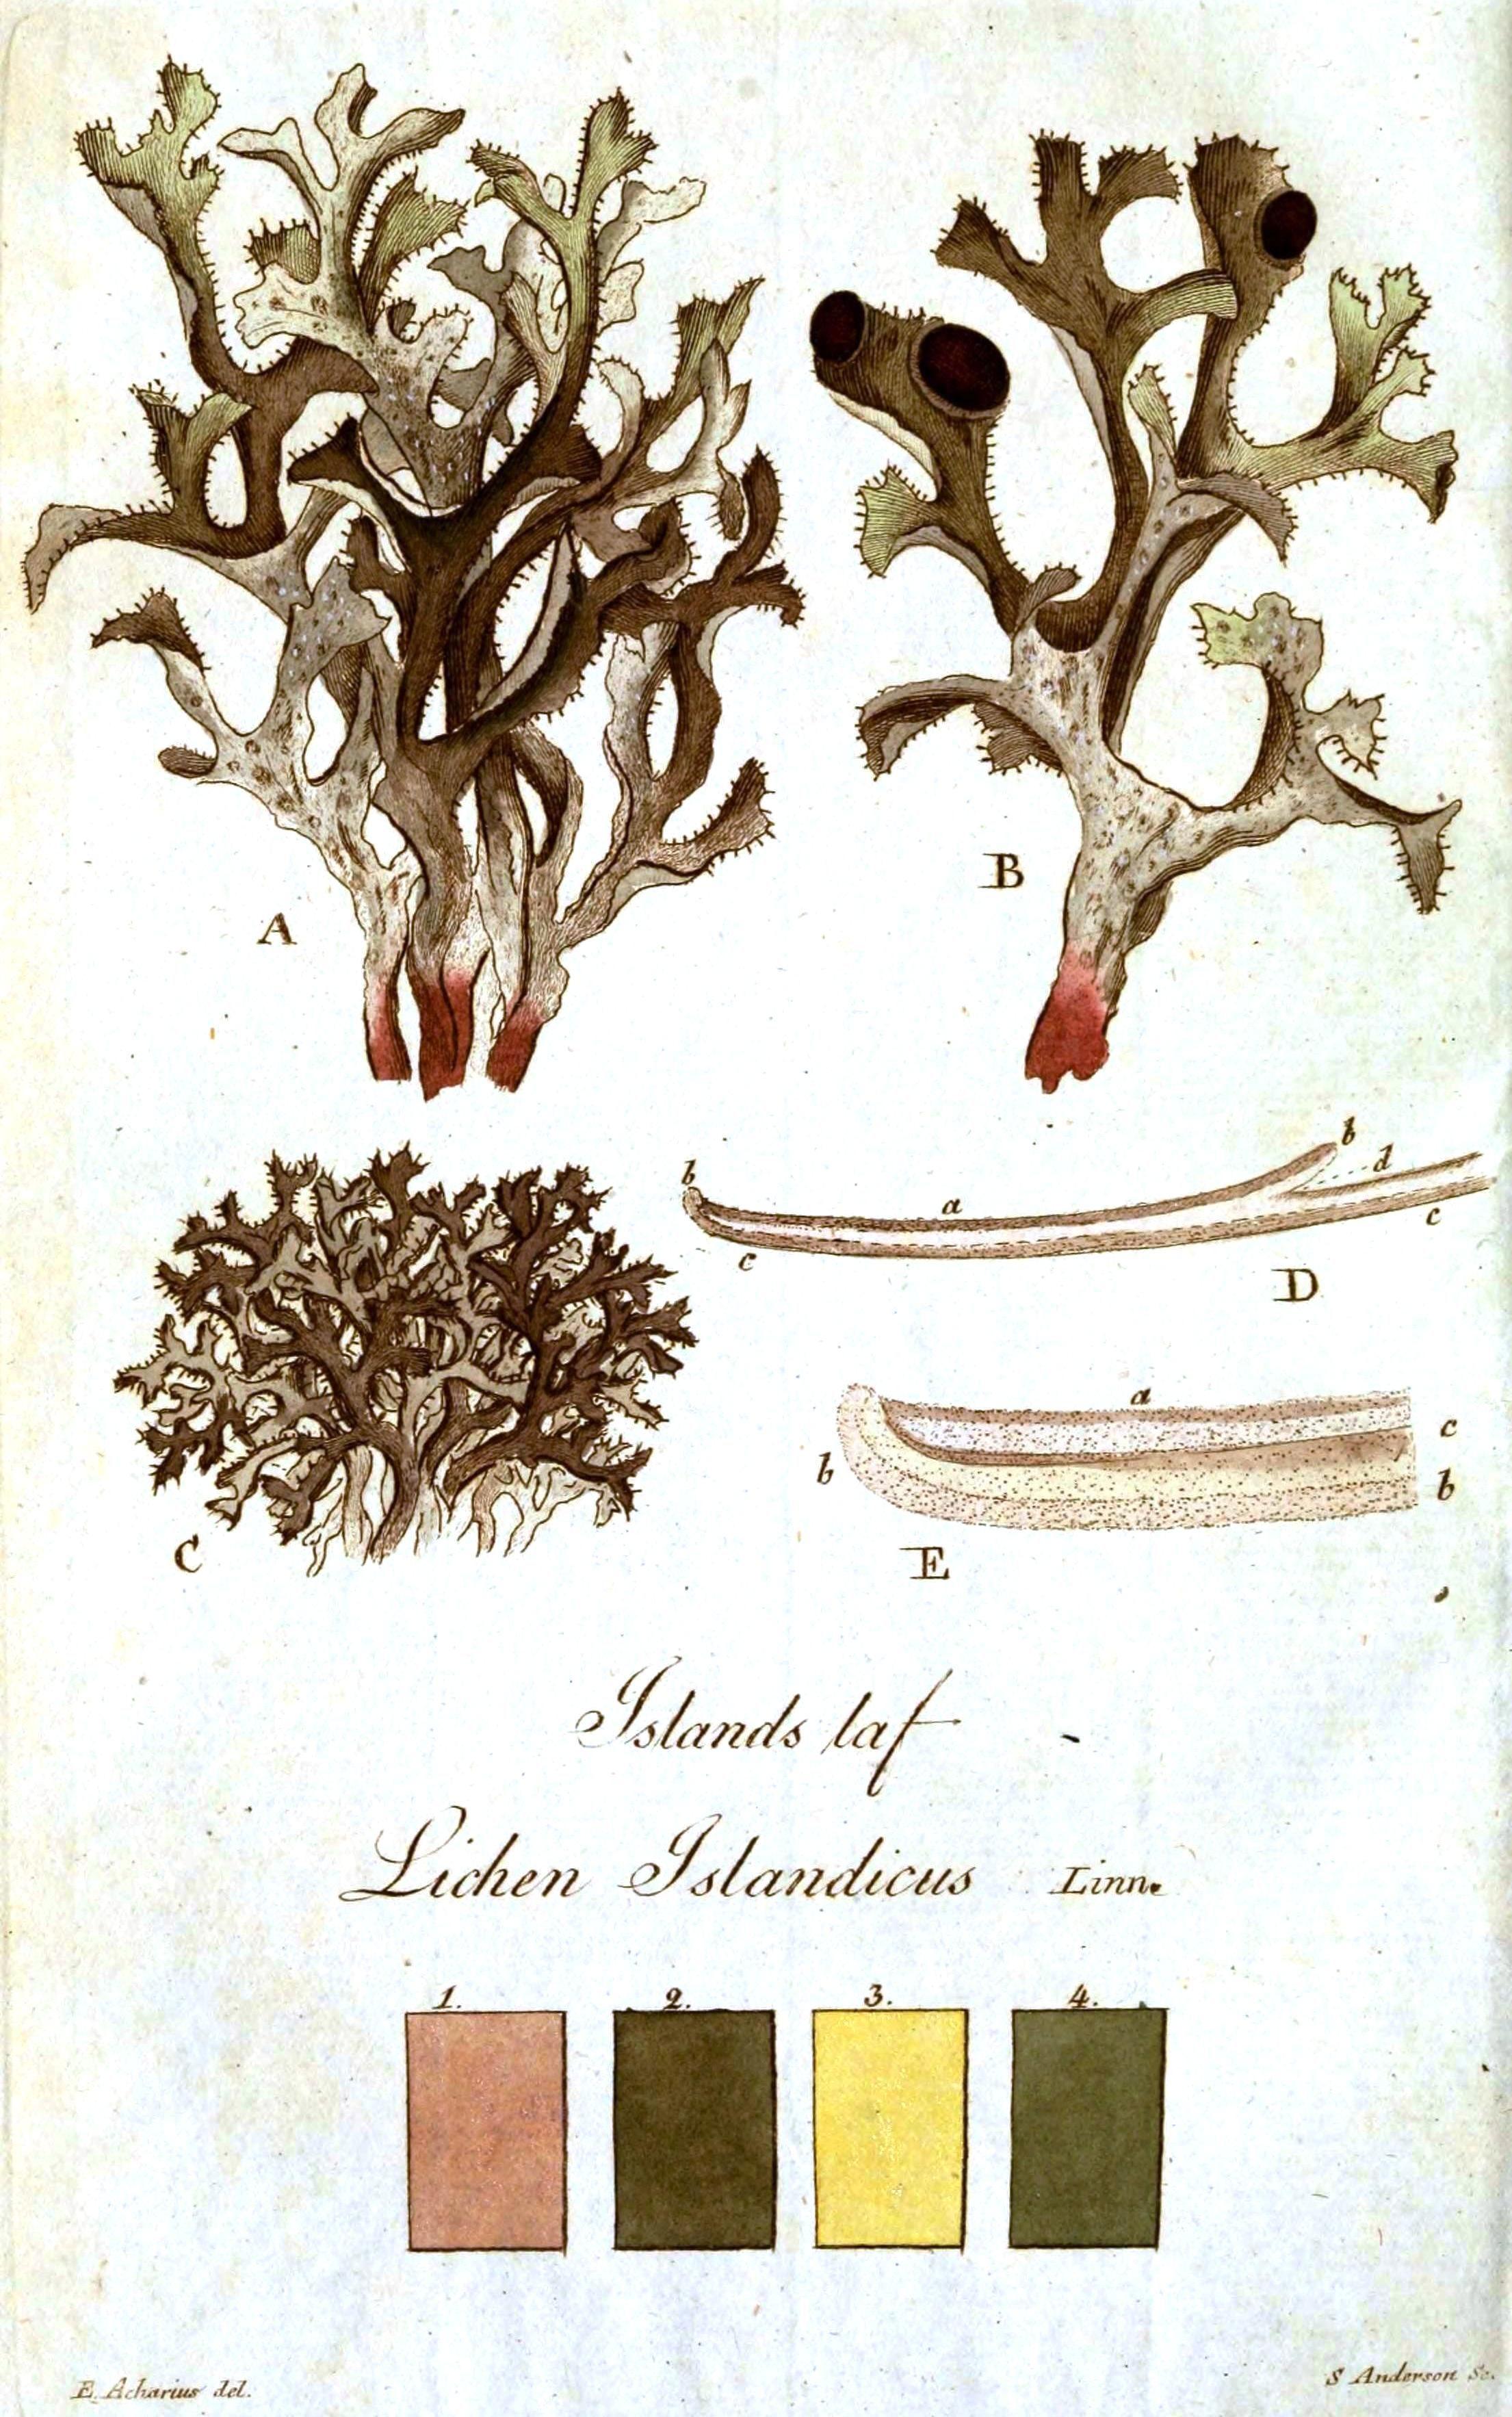 Vintage Printables   Mycology   Free Printable Art, Vintage Art - Free Printable Vintage Art